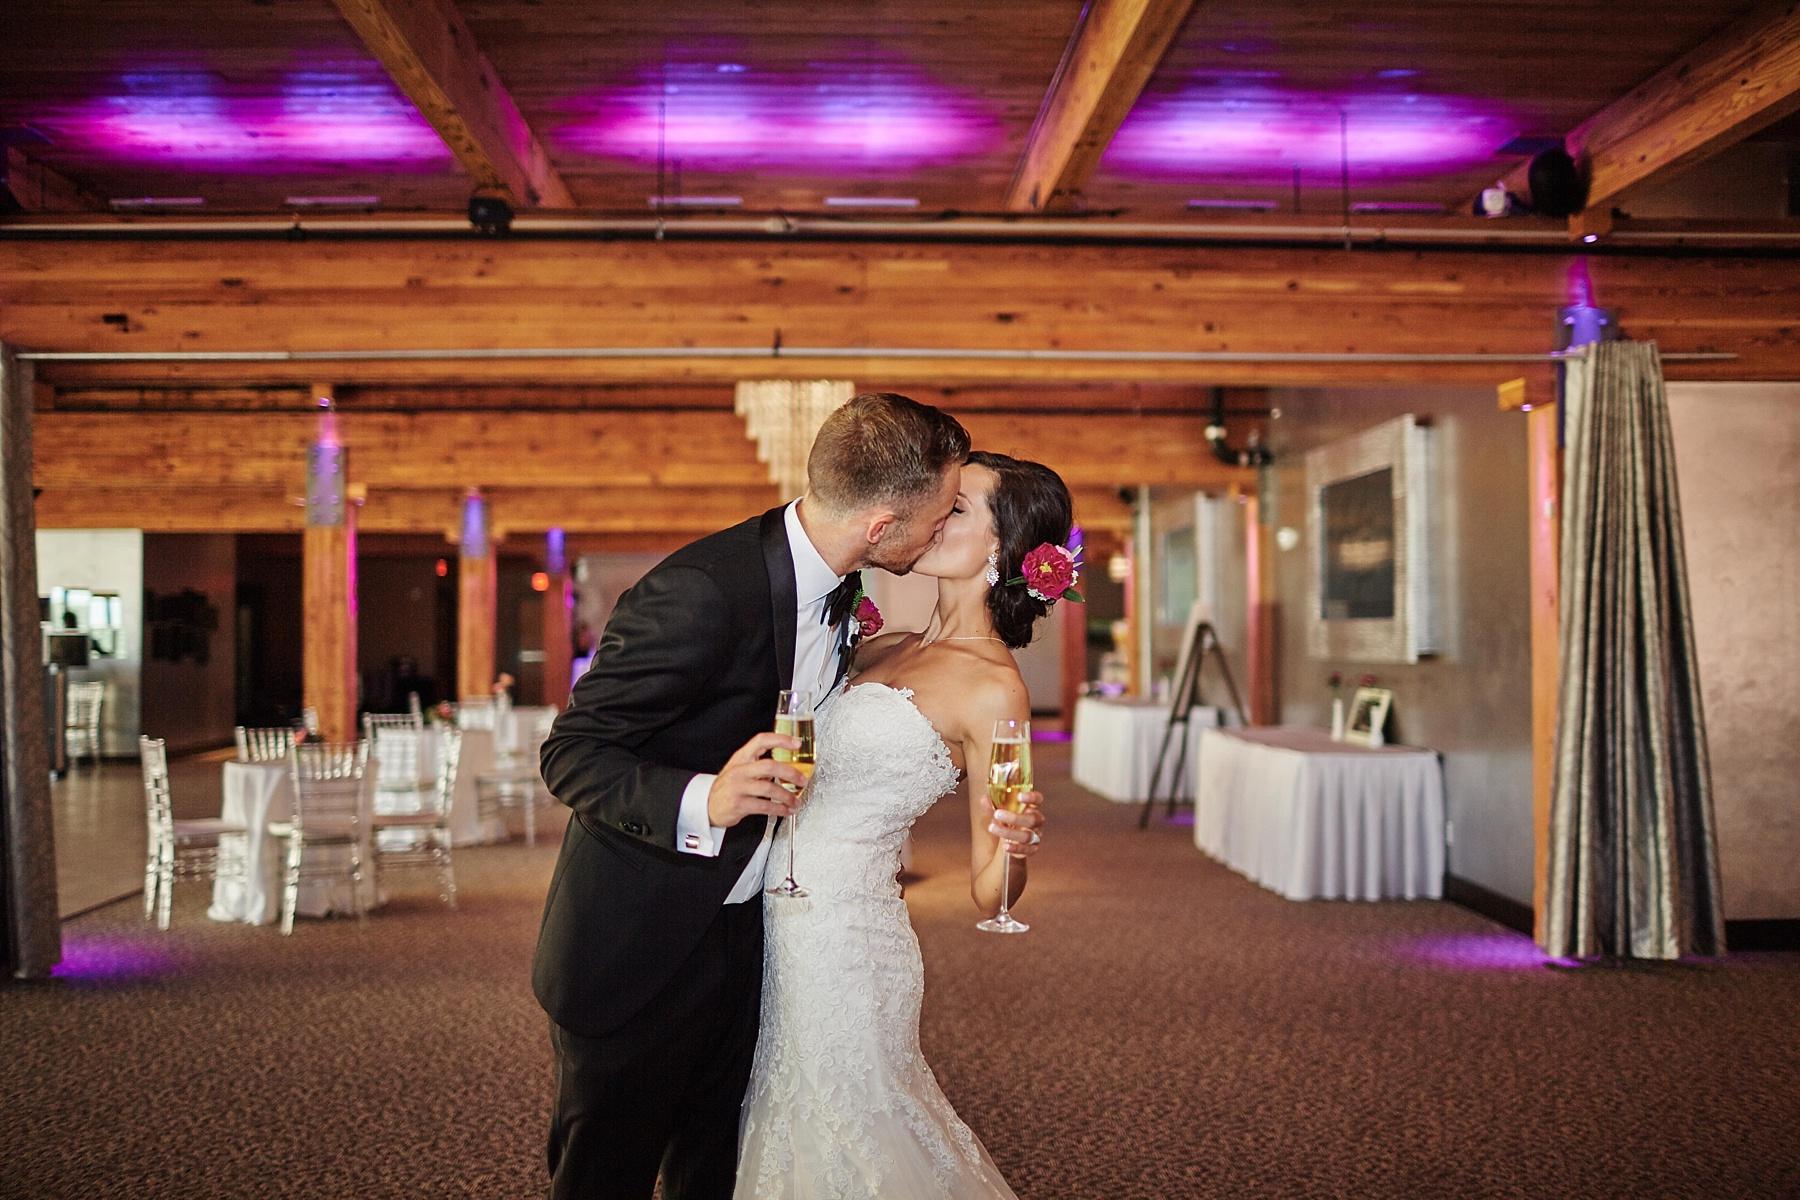 ABULAE-Wedding-Saint-paul-MN-Josh-Sofia-Wedding-Mears-Park_0809.jpg